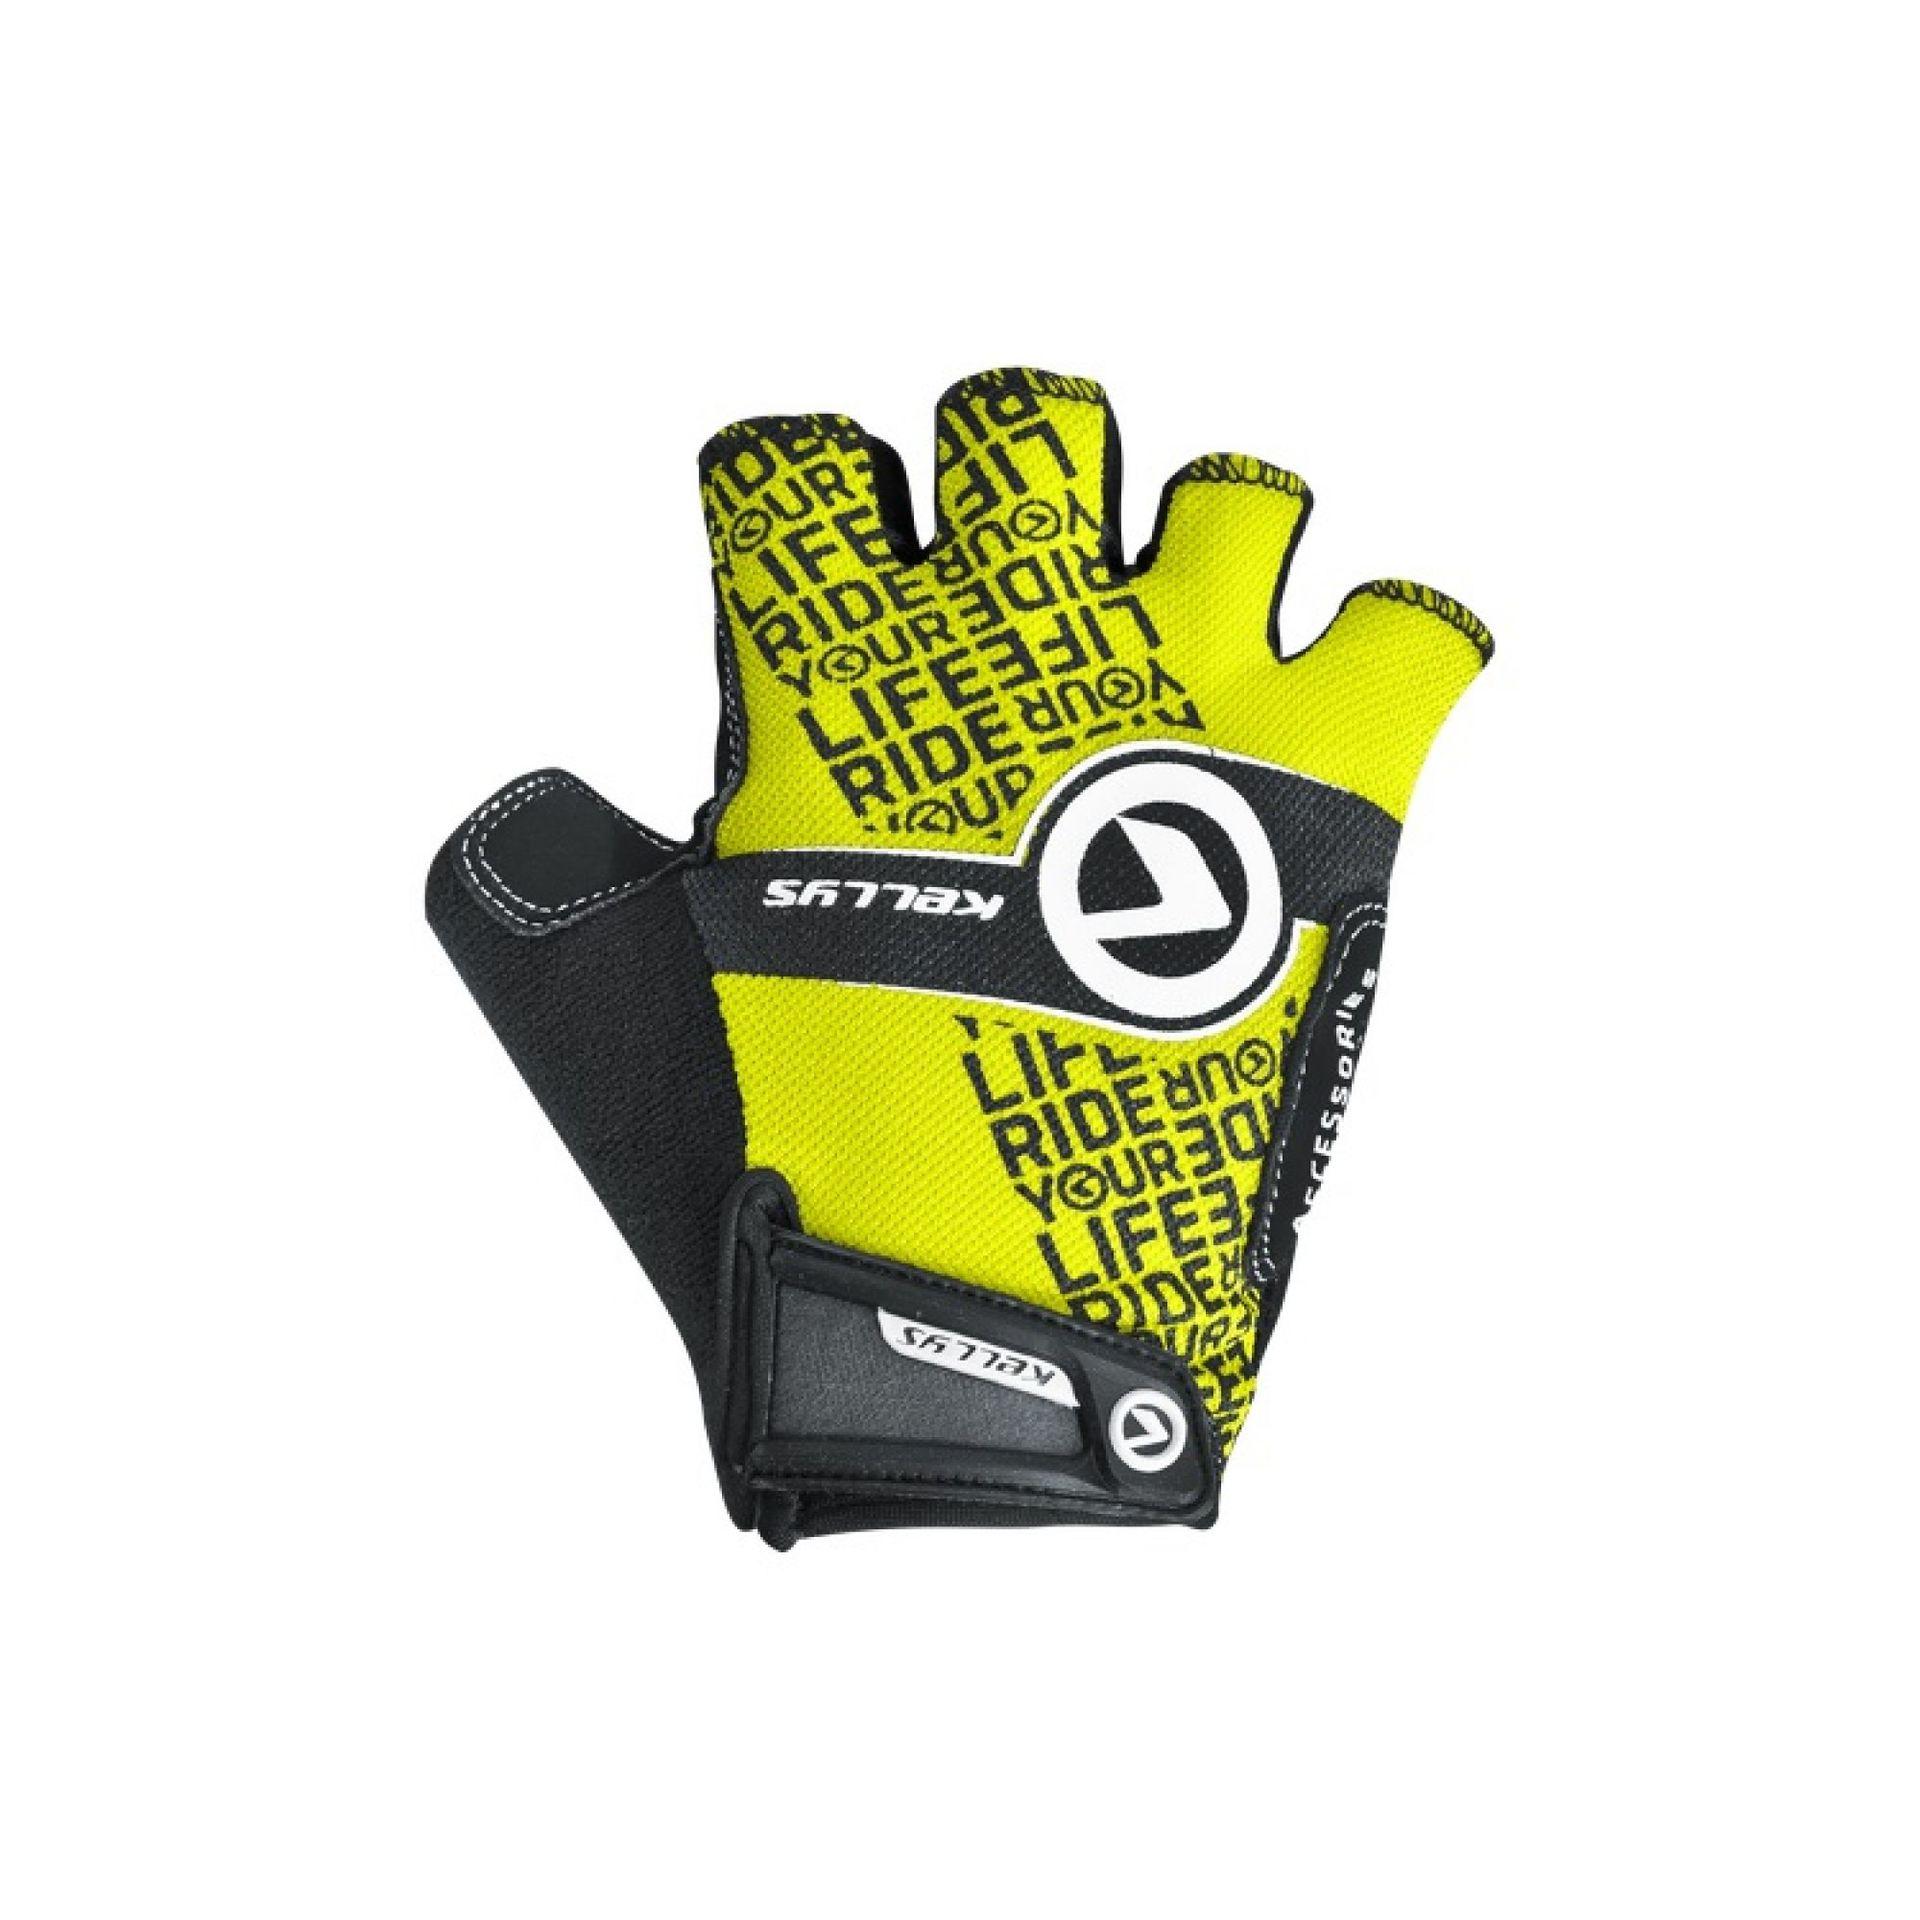 Rękawiczki rowerowe Kellys Comfort New limonkowe